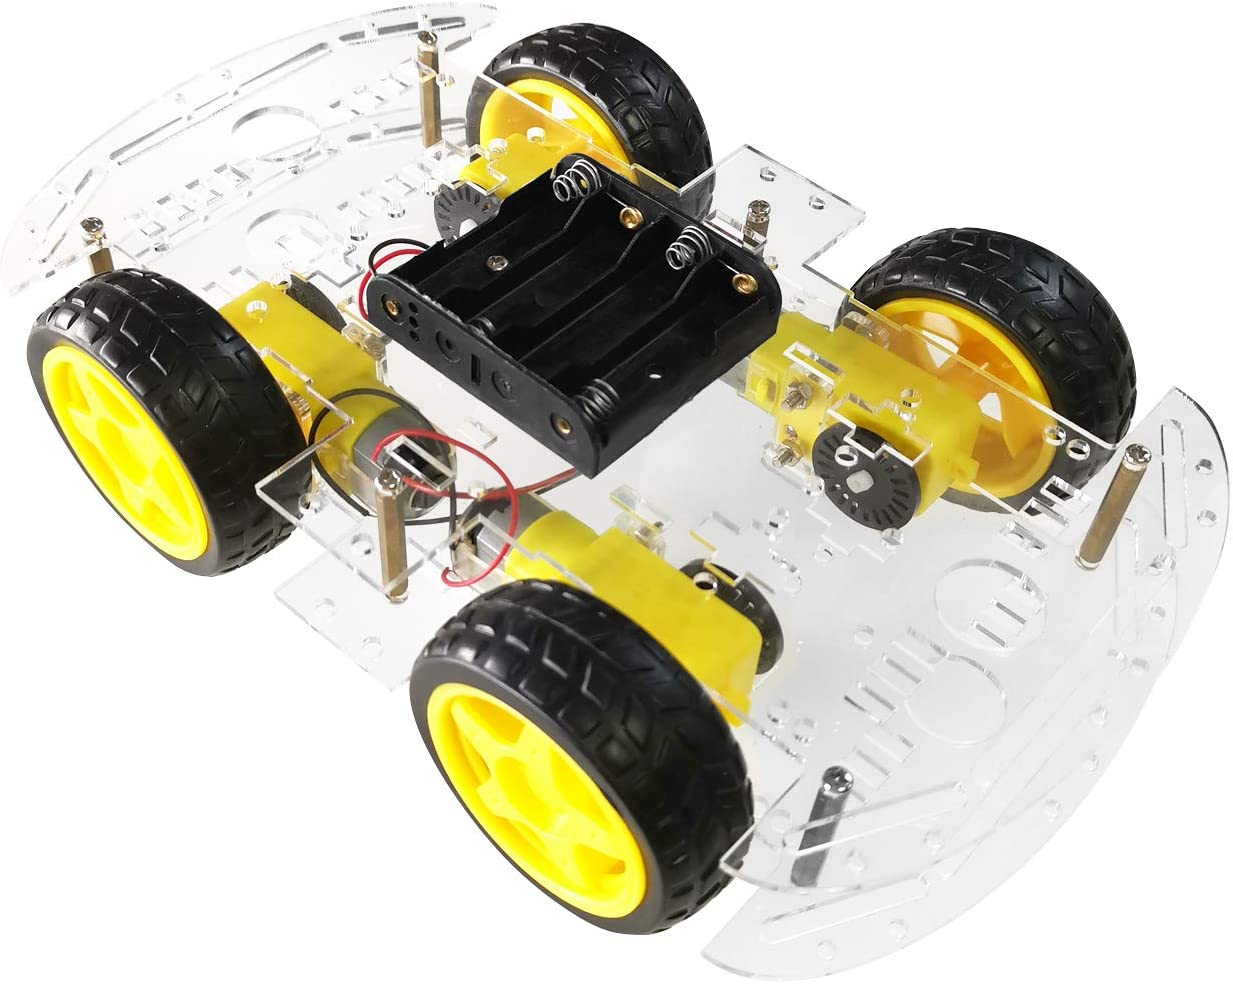 The perseids DIY Smart Motor Robot Kit Car Chassis, 4WD Chasis Robot Coche Kit con Encoder de Velocidad para Arduino (Cuatro Ruedas)